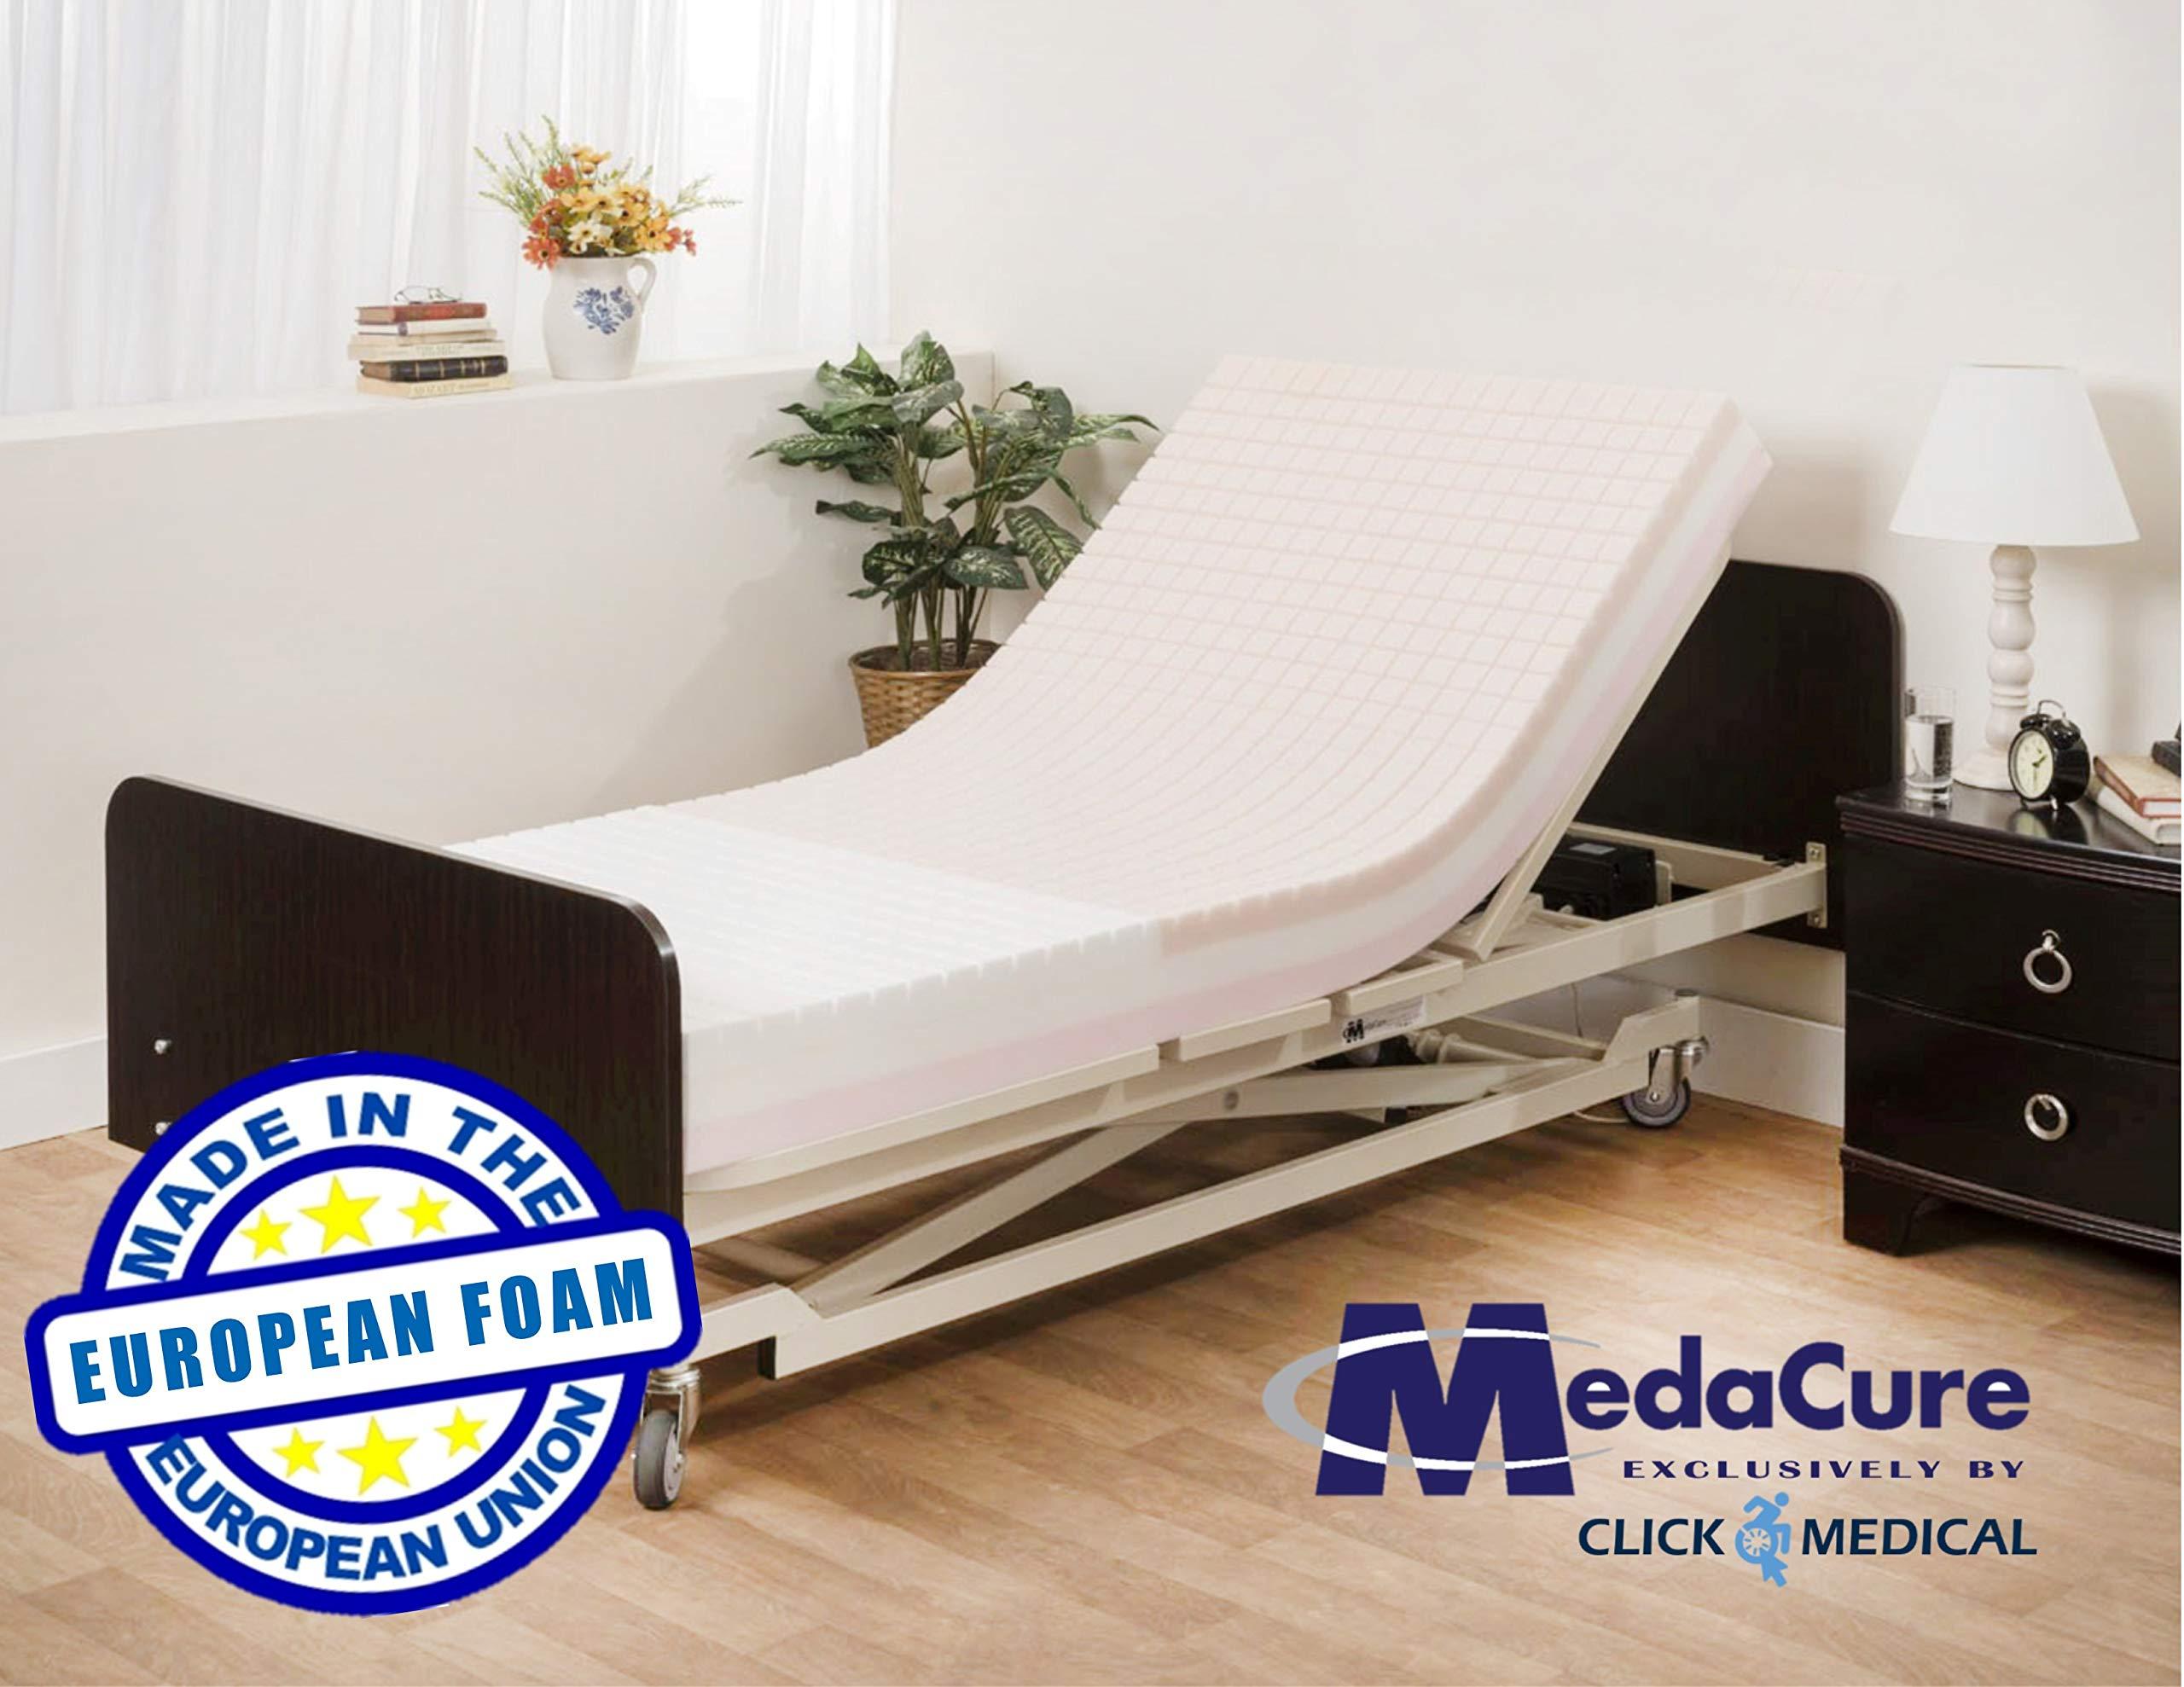 Pressure Redistribution Foam Mattress with Visco Elastic Memory Foam, 3 Layered Foam, by Medacure